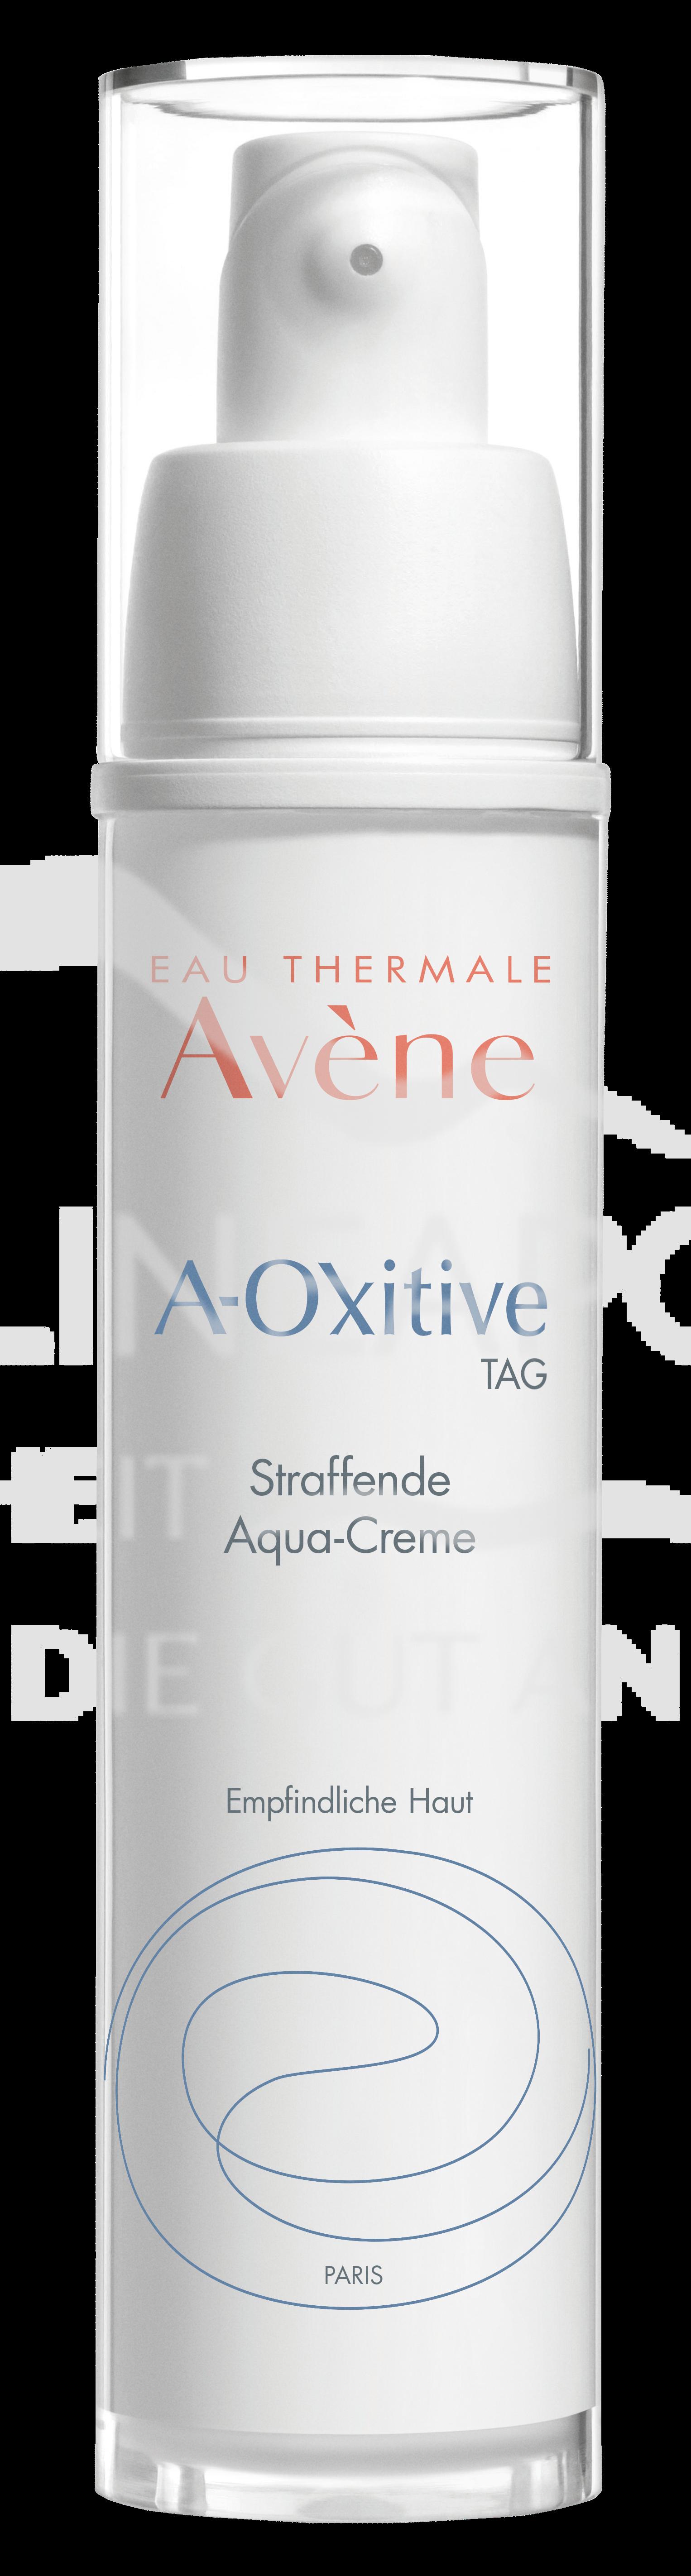 Avène A-Oxitive Tag Straffende Aqua-Creme